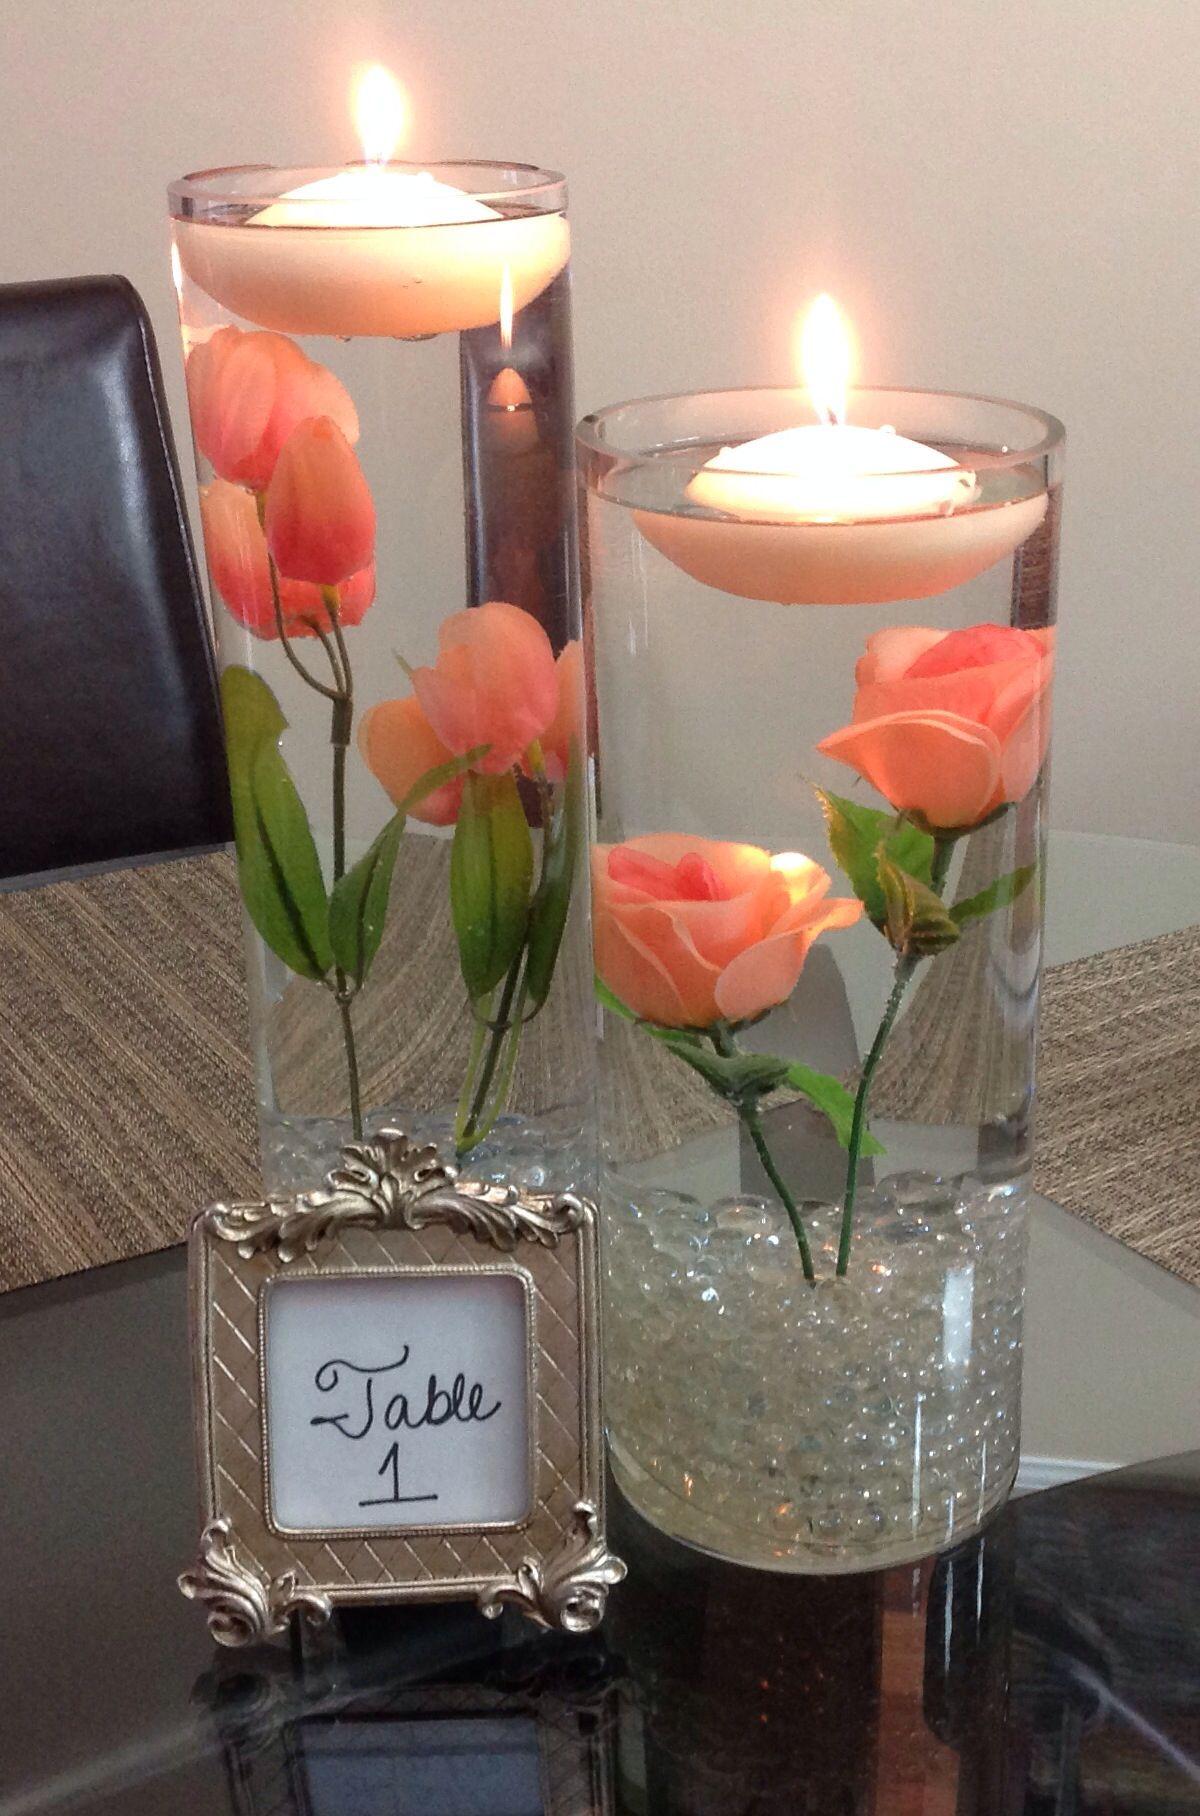 Diy flower decorations wedding  My DIY centerpieces  Centerpiece Ideas  Pinterest  Centerpieces